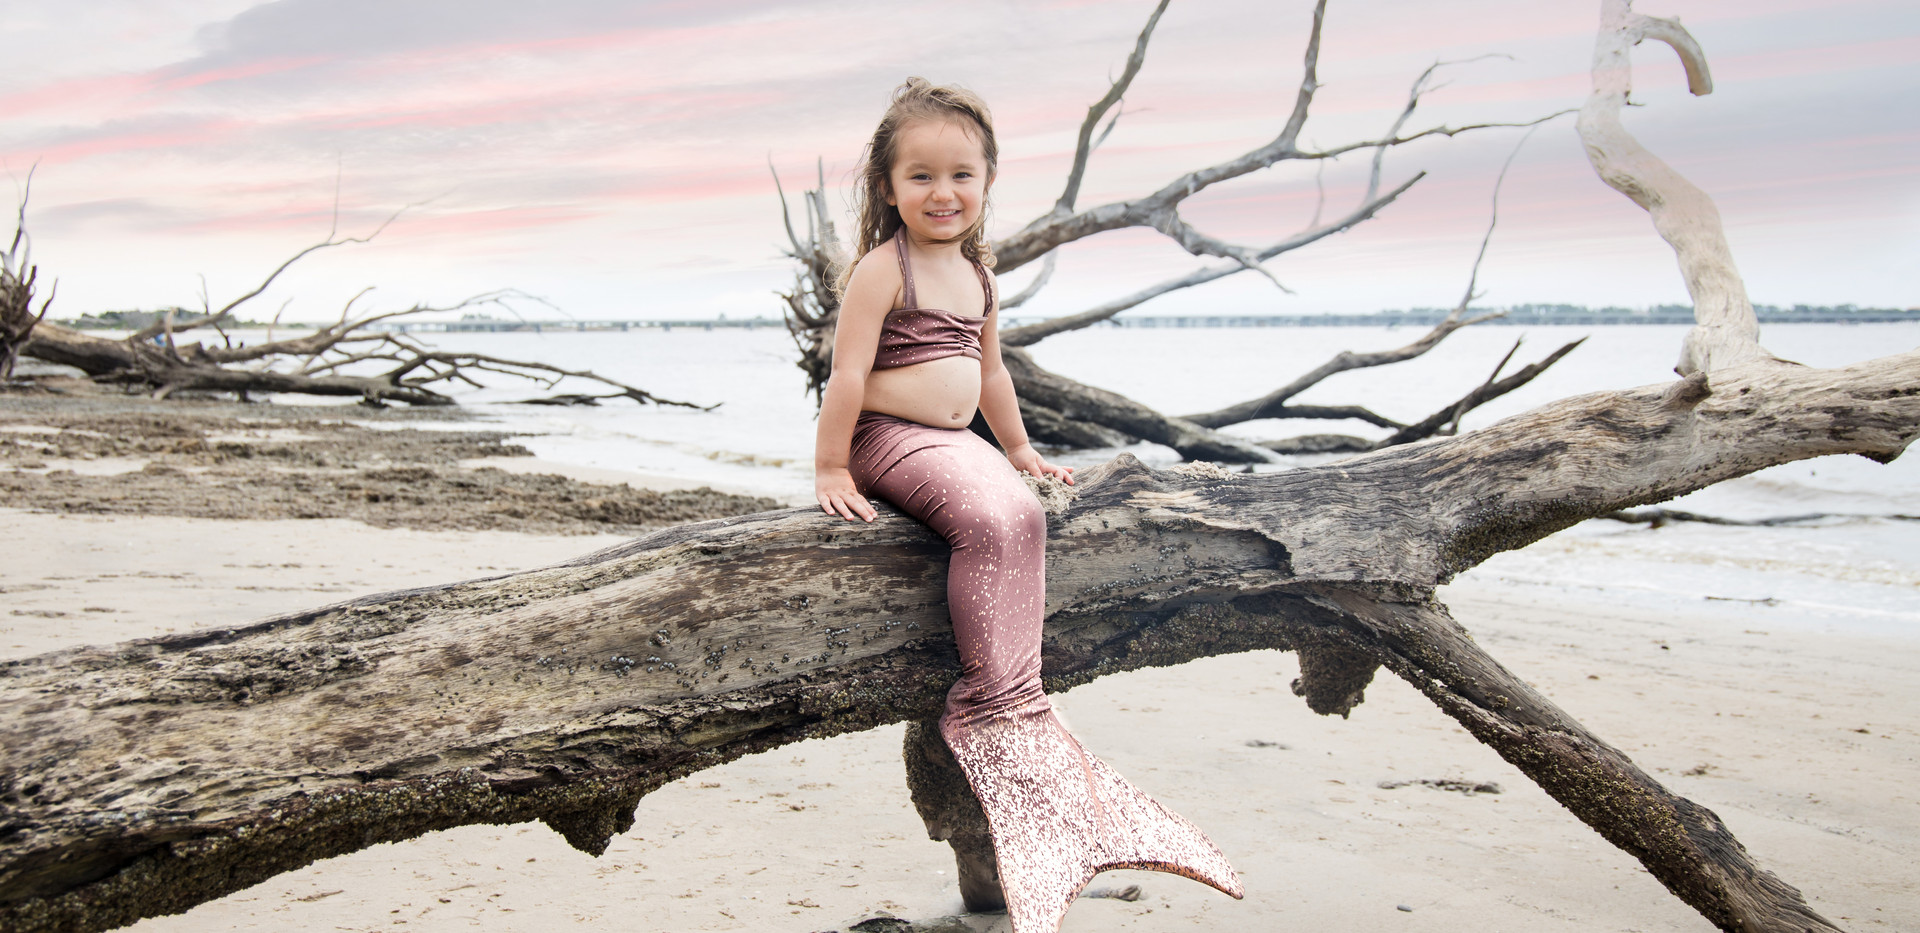 2 T Mermaid Tail